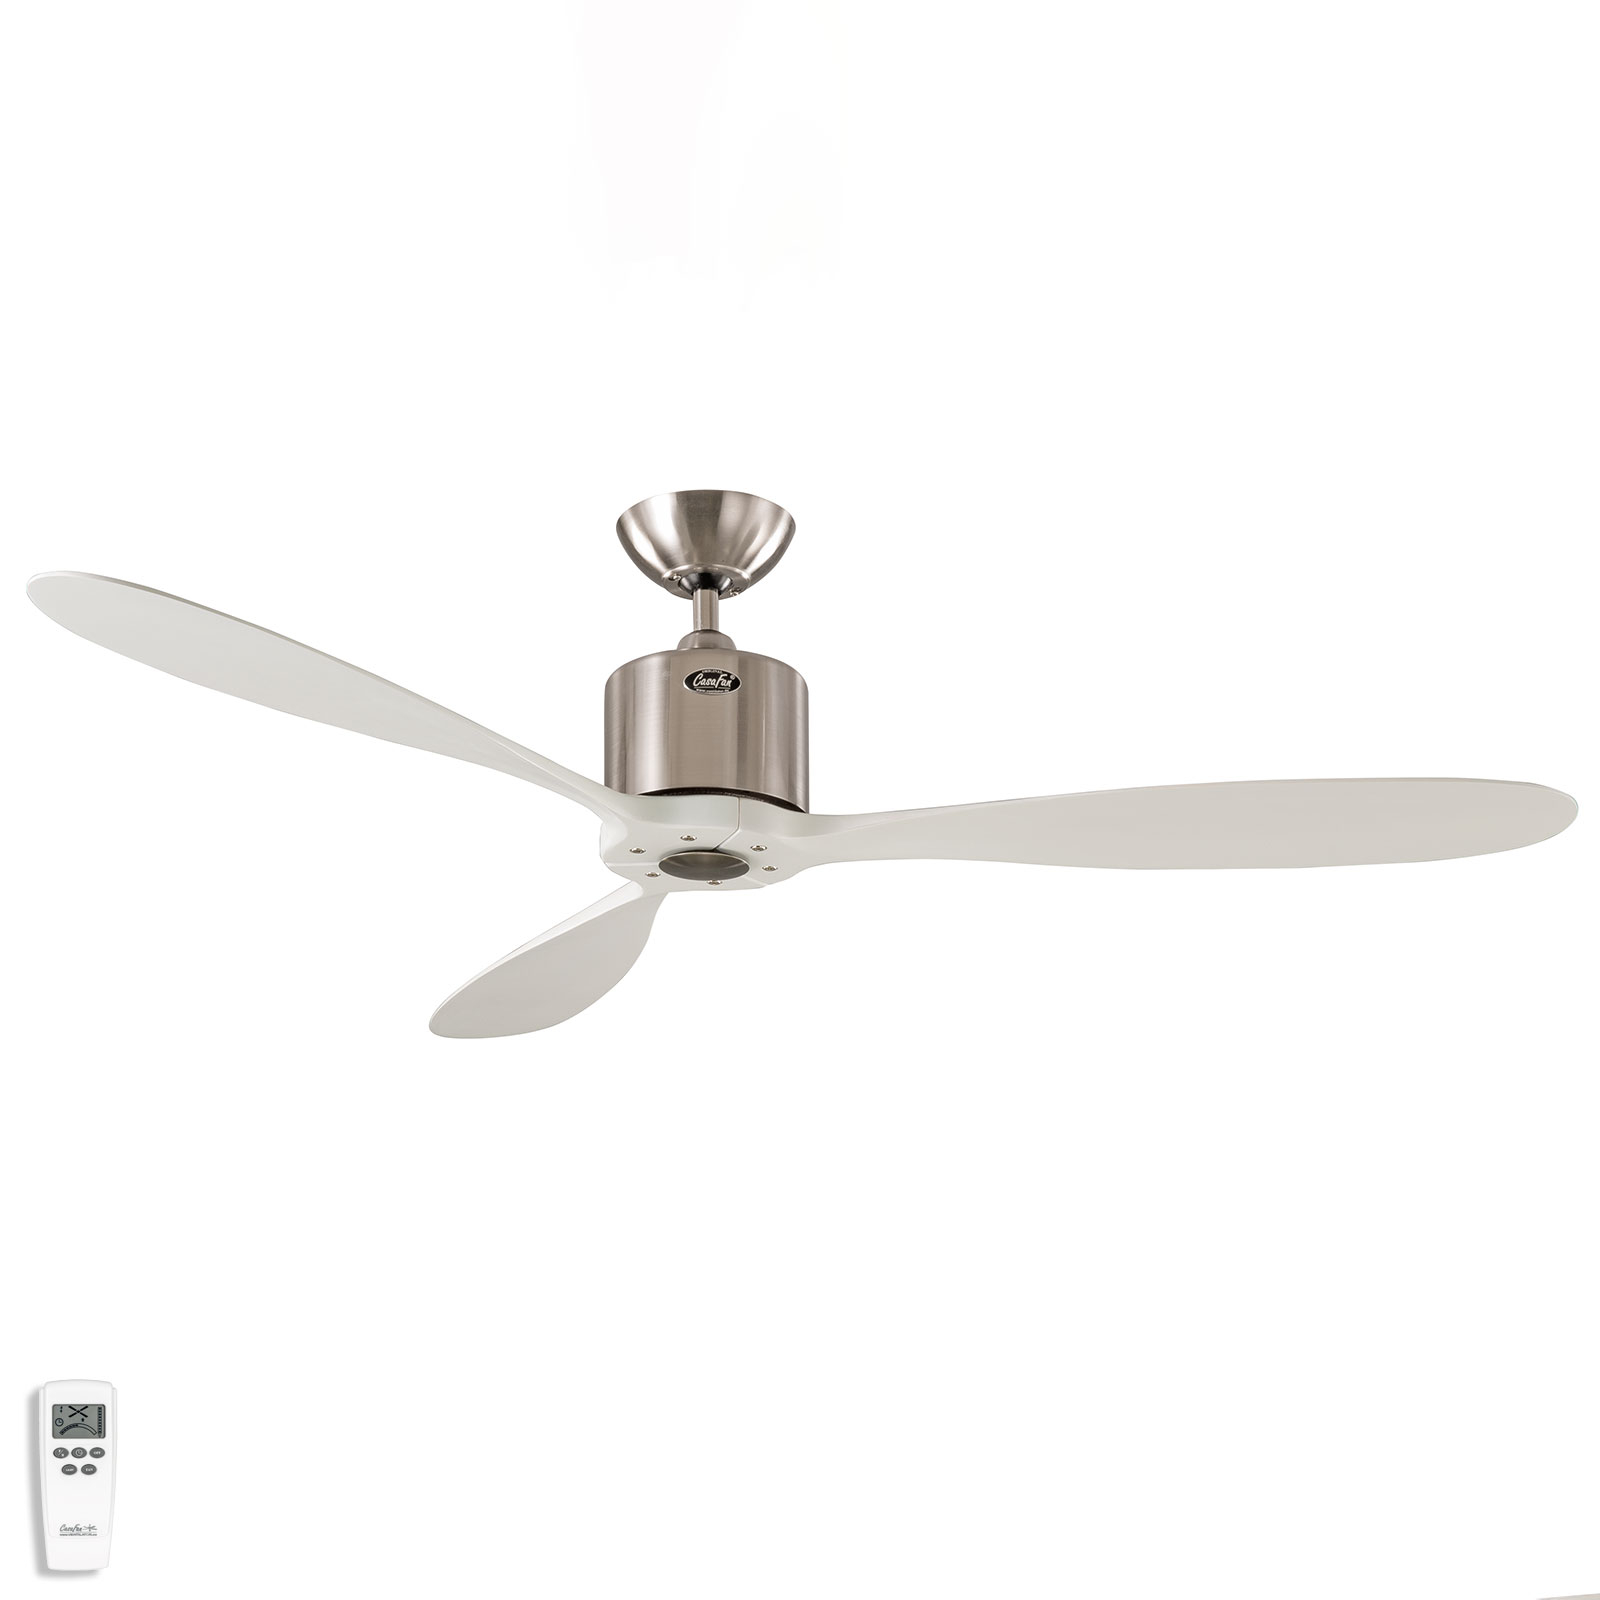 Deckenventilator Aeroplan Eco, chrom, weiß